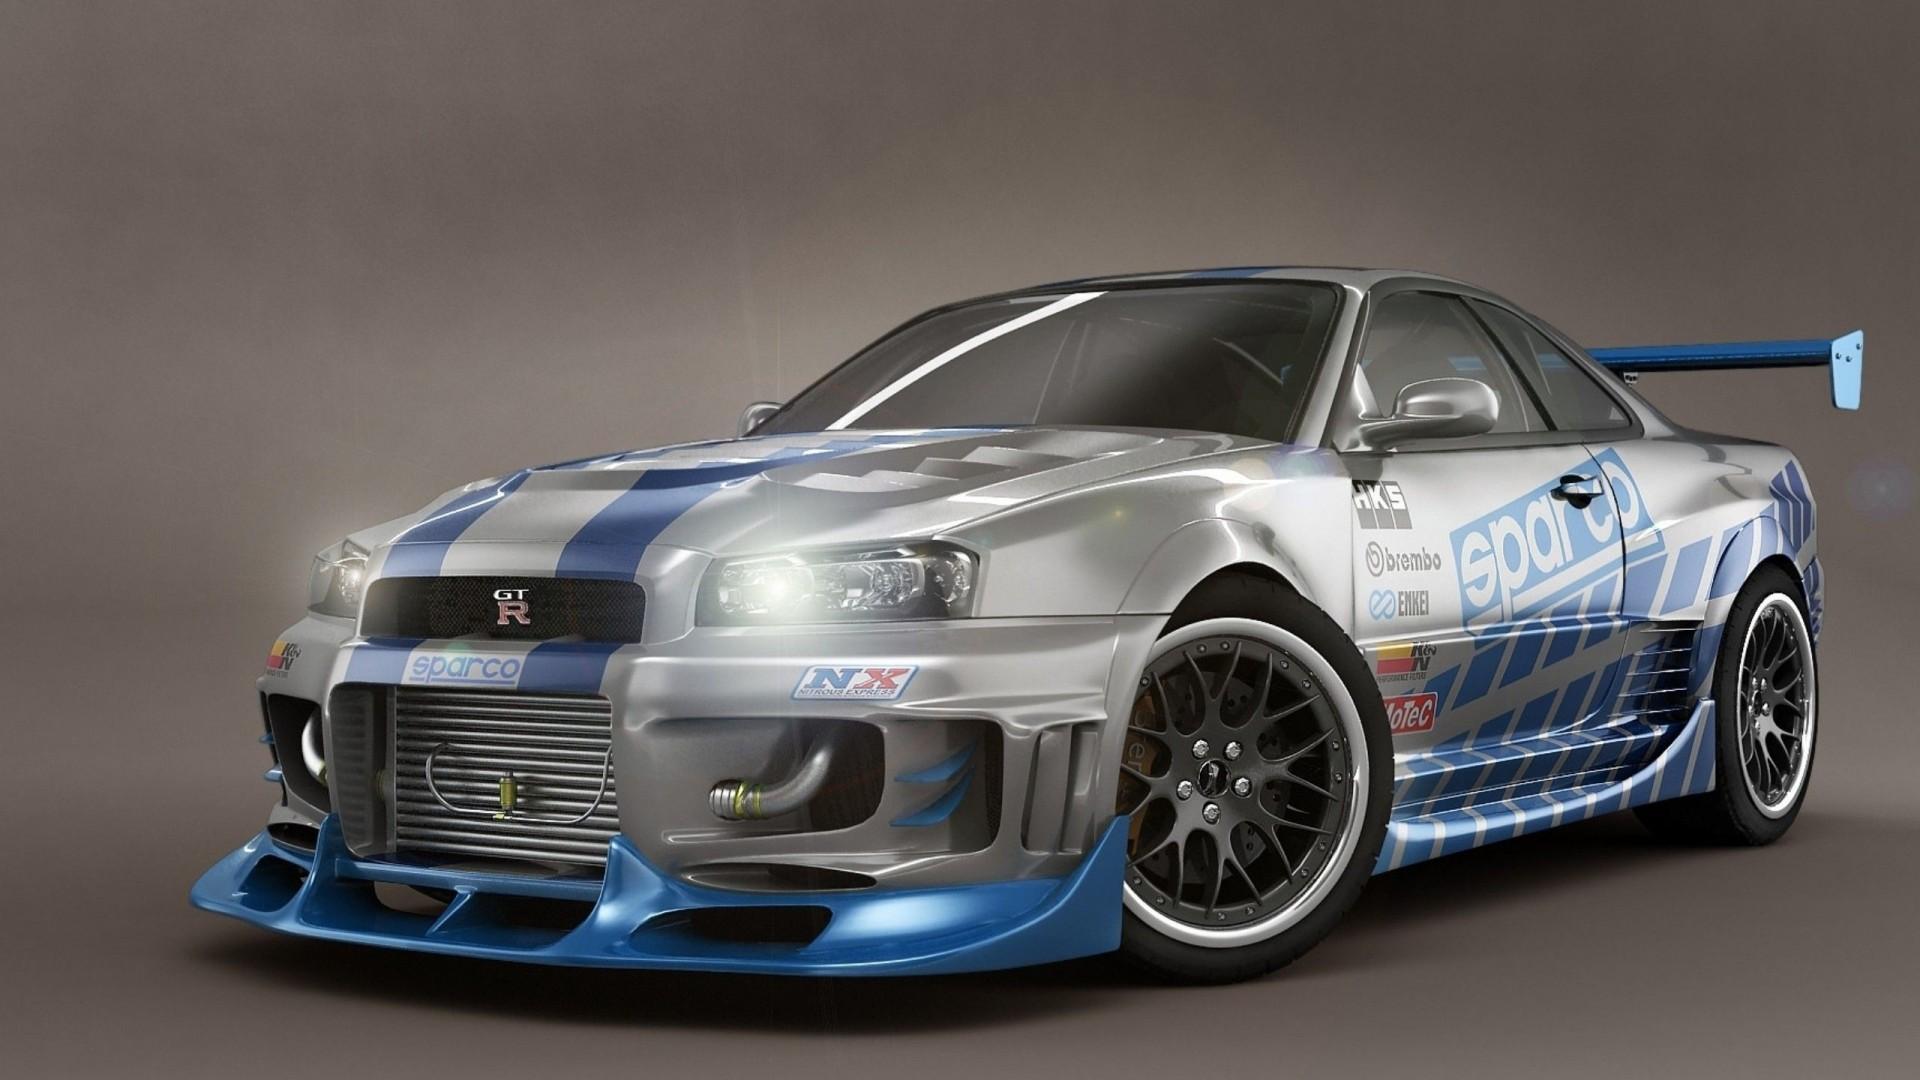 Nissan Skyline GTR Tuning Exclusive HD Wallpapers 4385 1920x1080